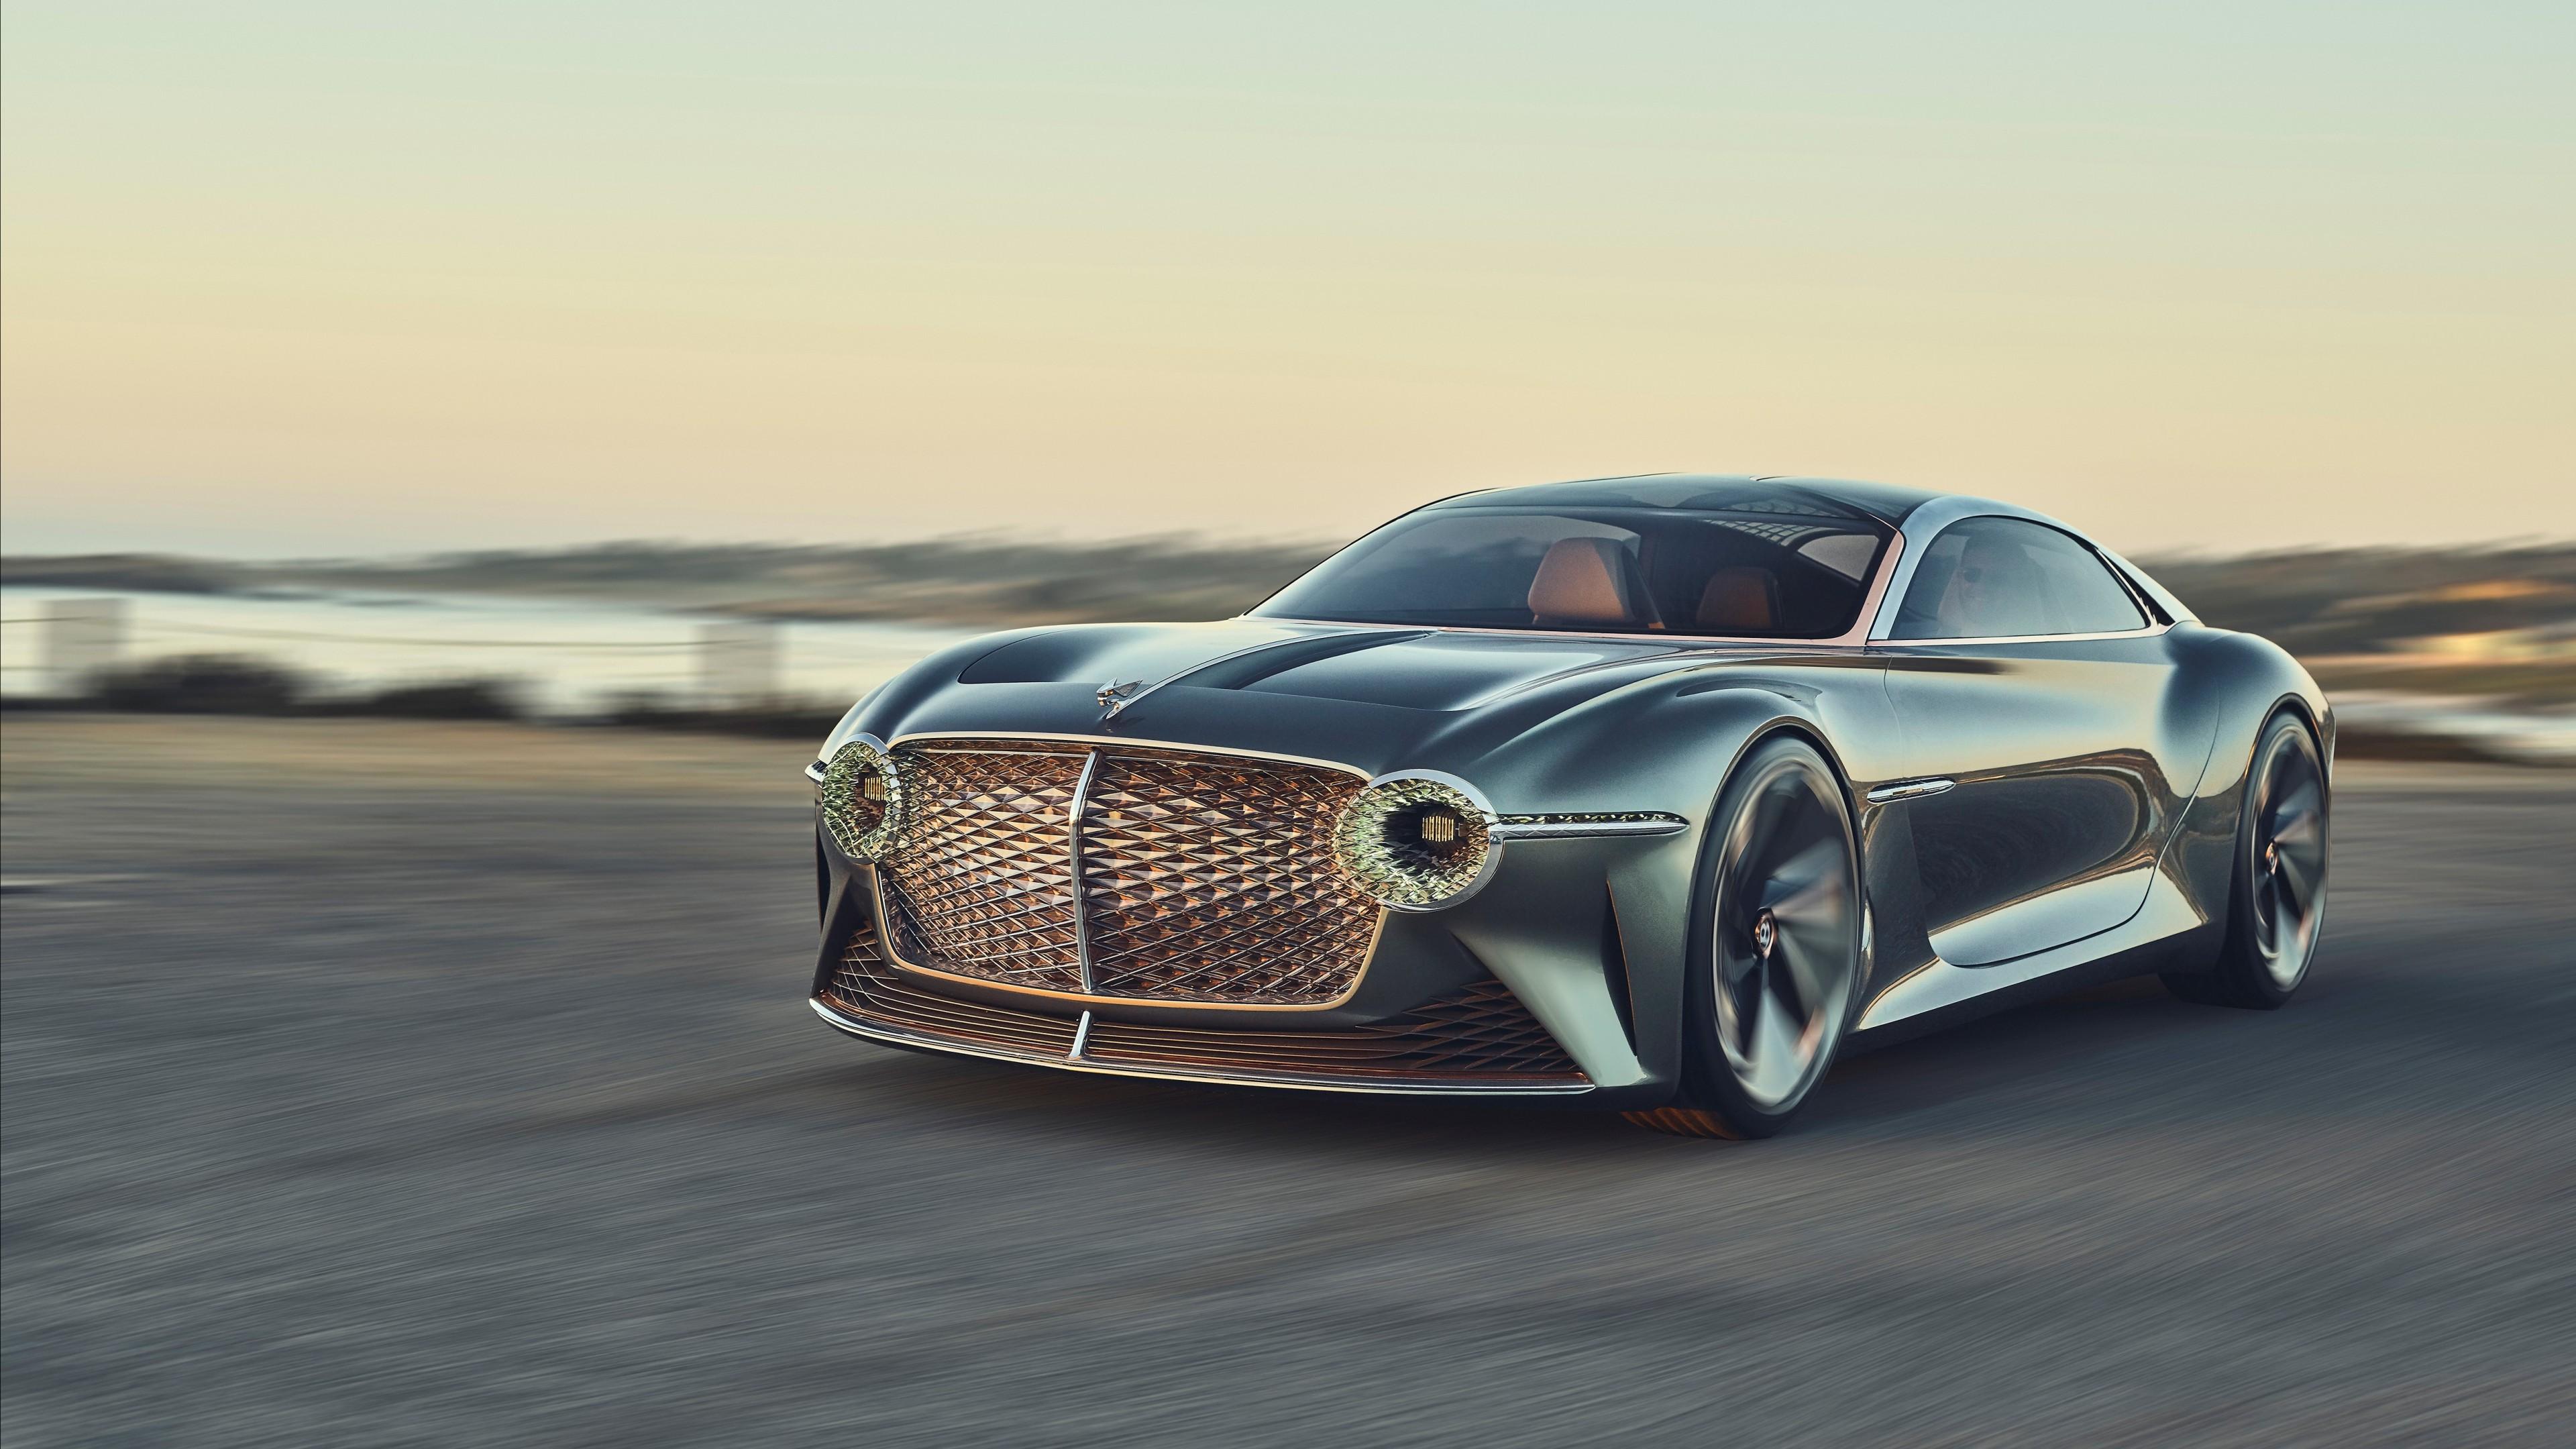 Wallpaper Bentley Exp 100 Gt Luxury Cars 4k Cars